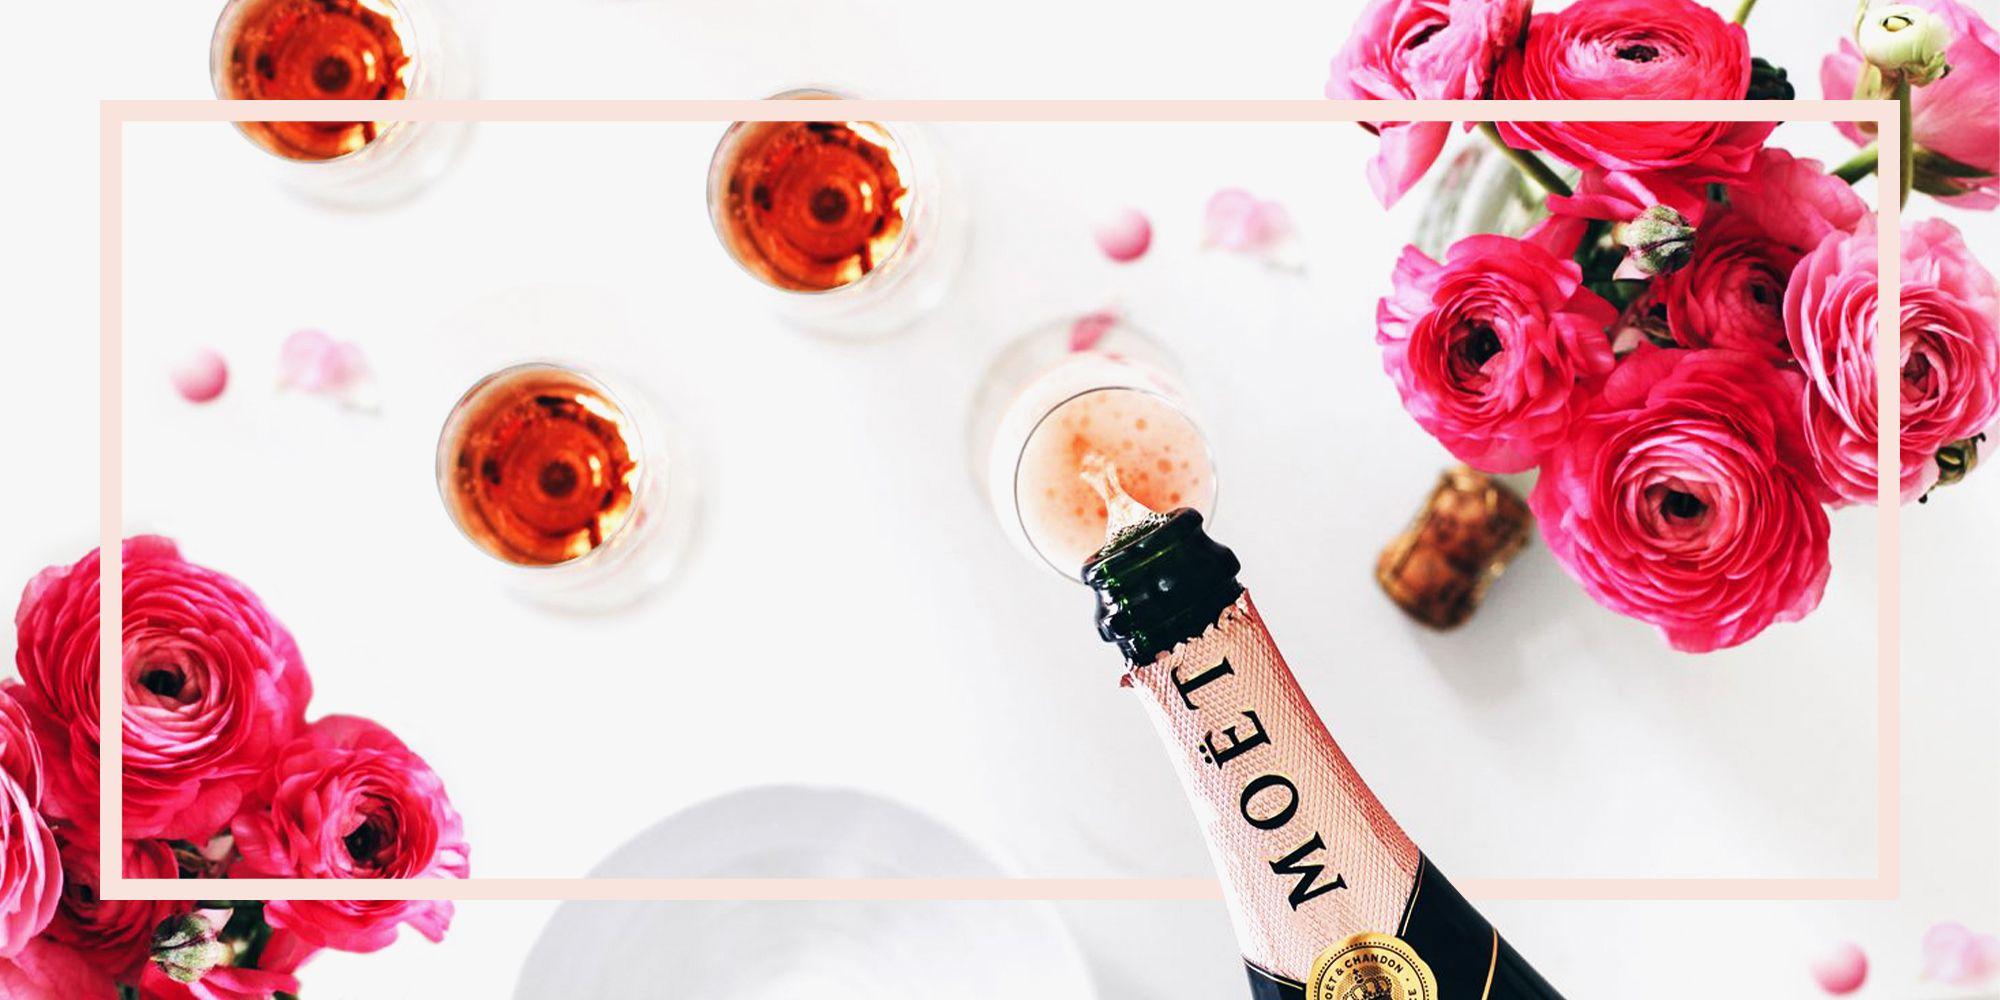 11 Best Mini Wine & Champagne Bottles in 2018 - Cute Mini Wine ...